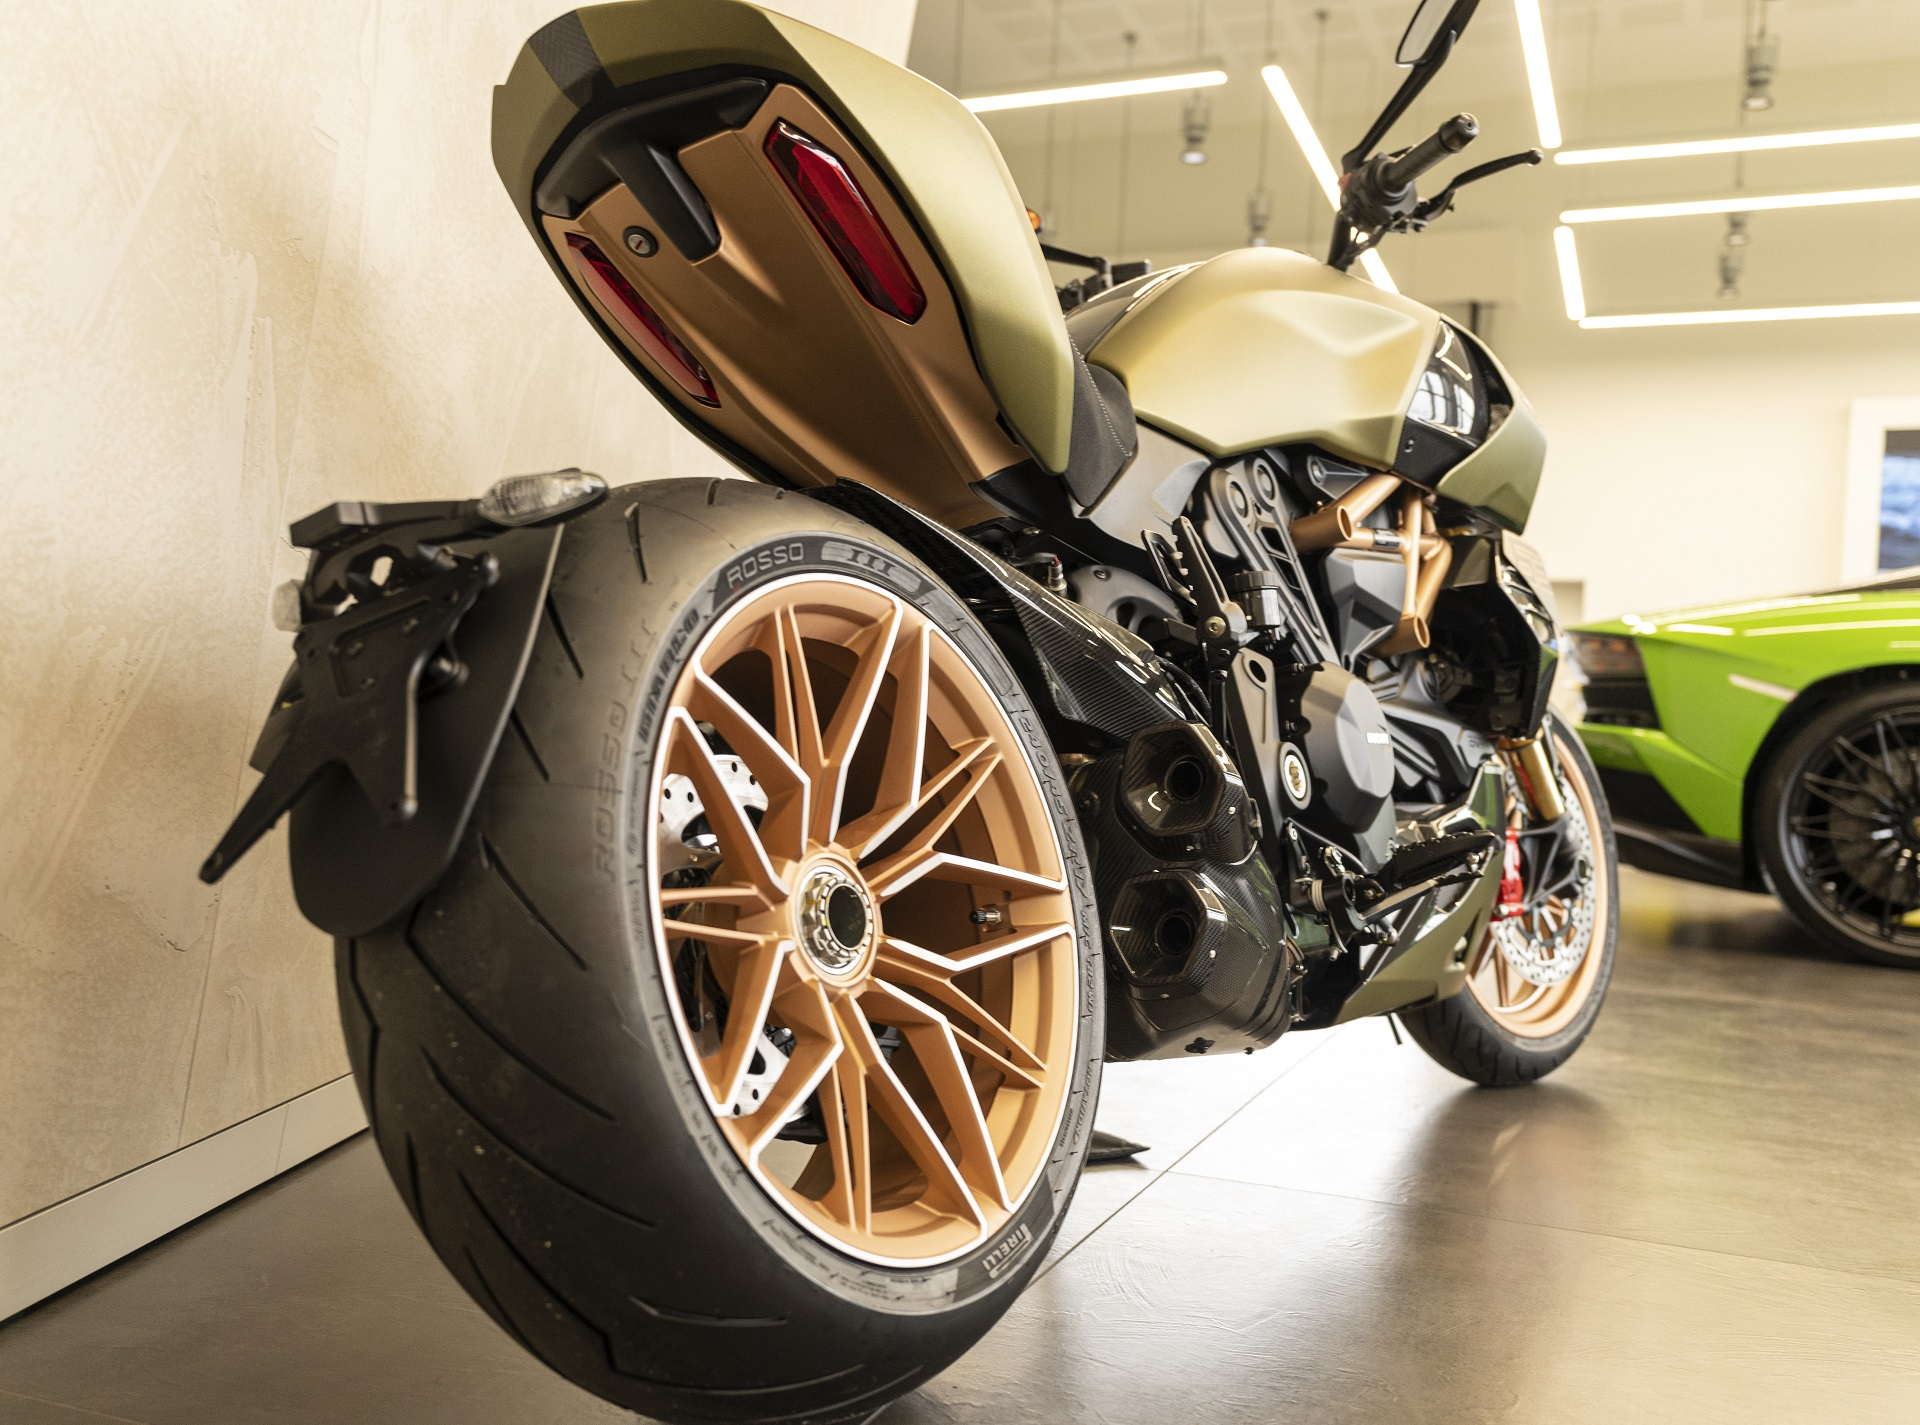 Lamborghini Ducati Diavel 1260 arriere